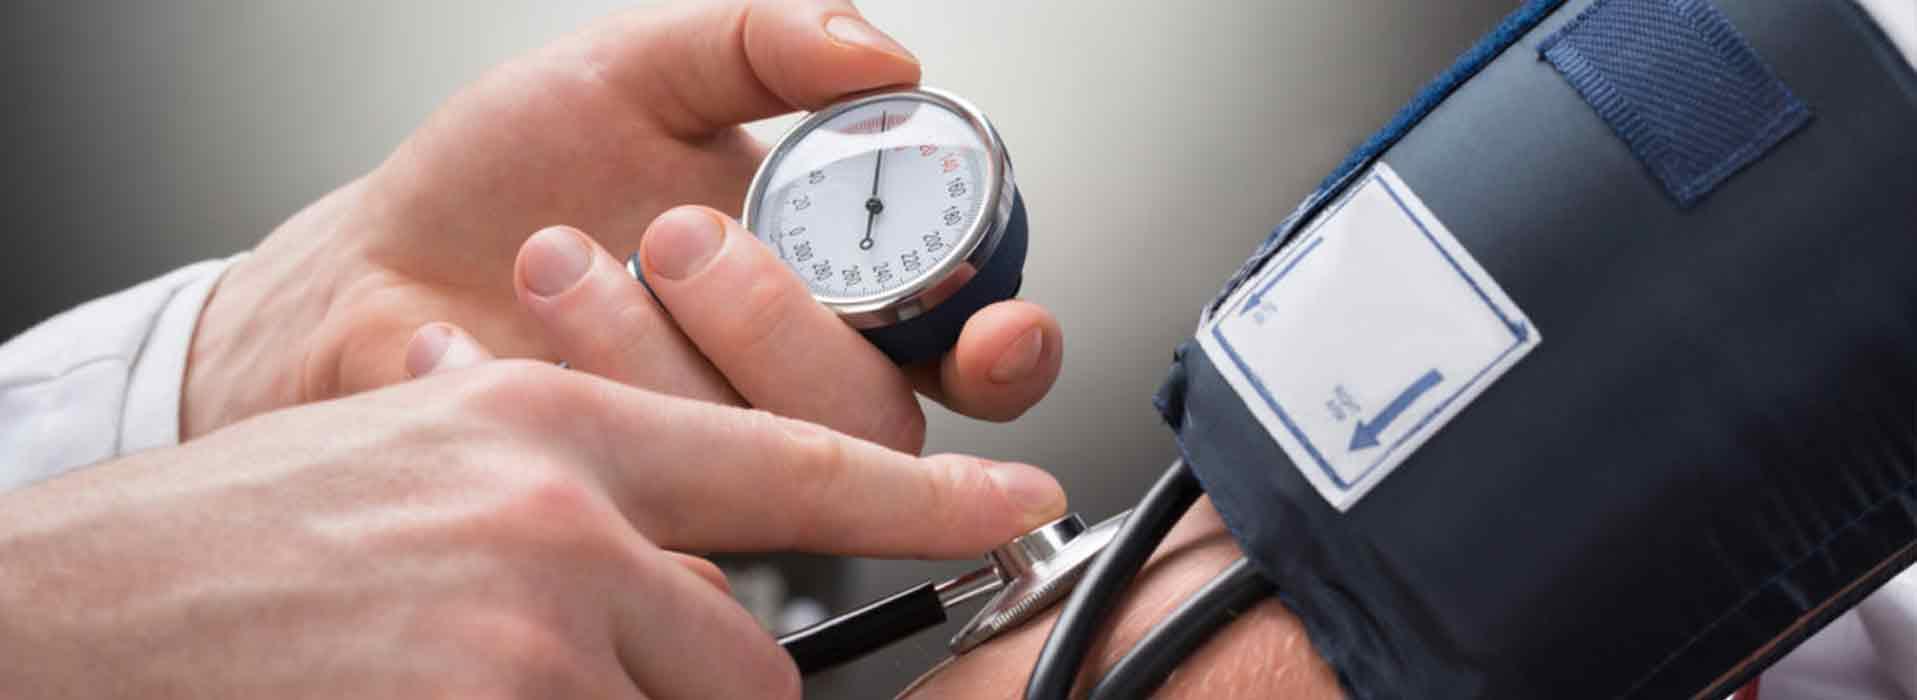 Longembolie hoge bloeddruk